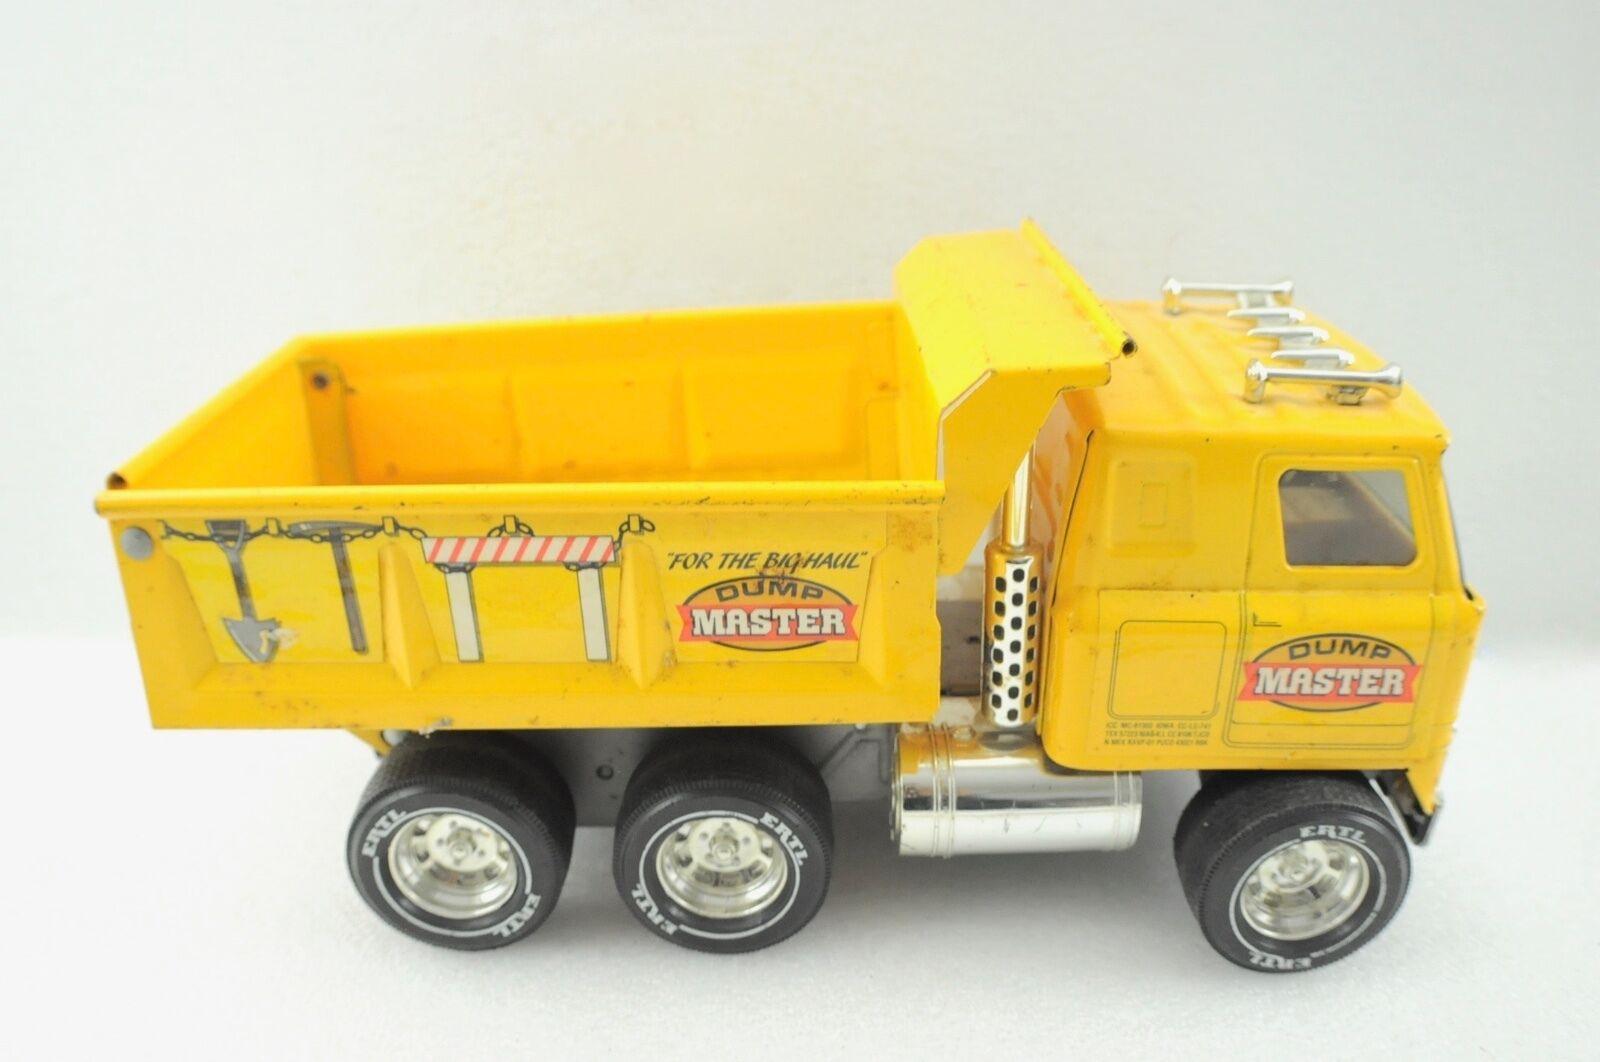 Vintage ERTL camion benne Master  Camion Nice  Réponses rapides